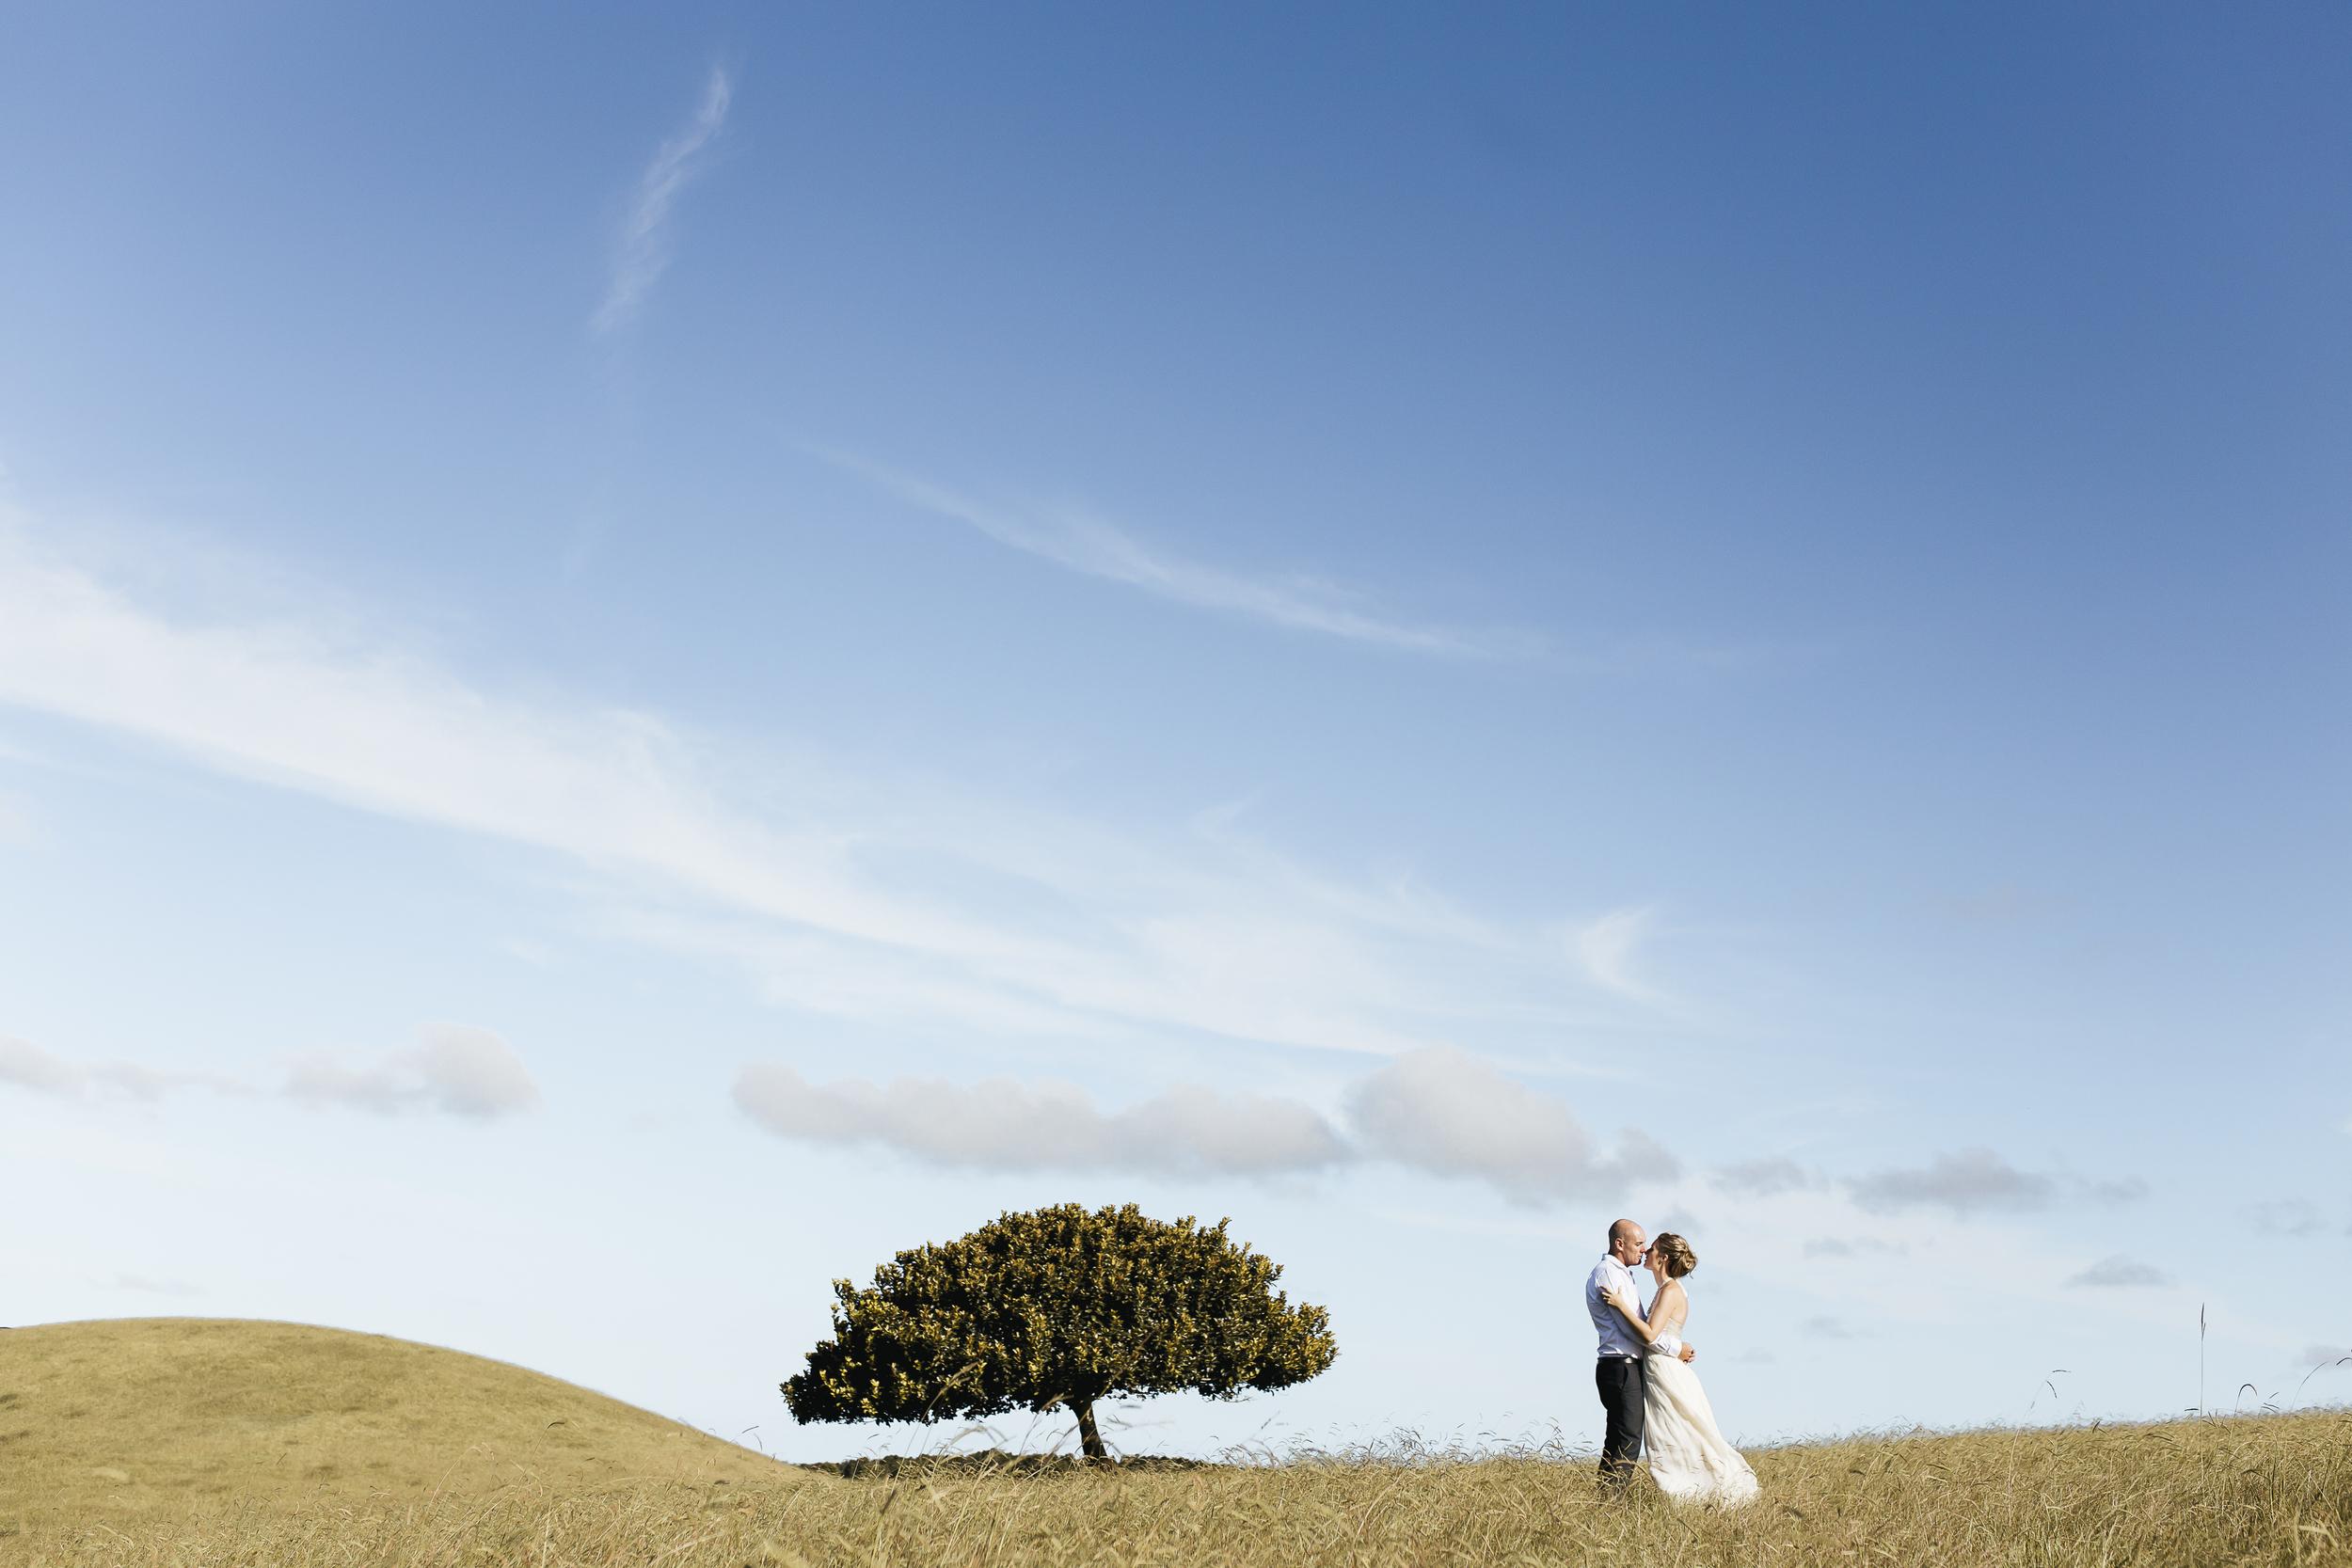 Byron Bay Wedding Harvest Cafe - Carly Tia Photography 017.jpg